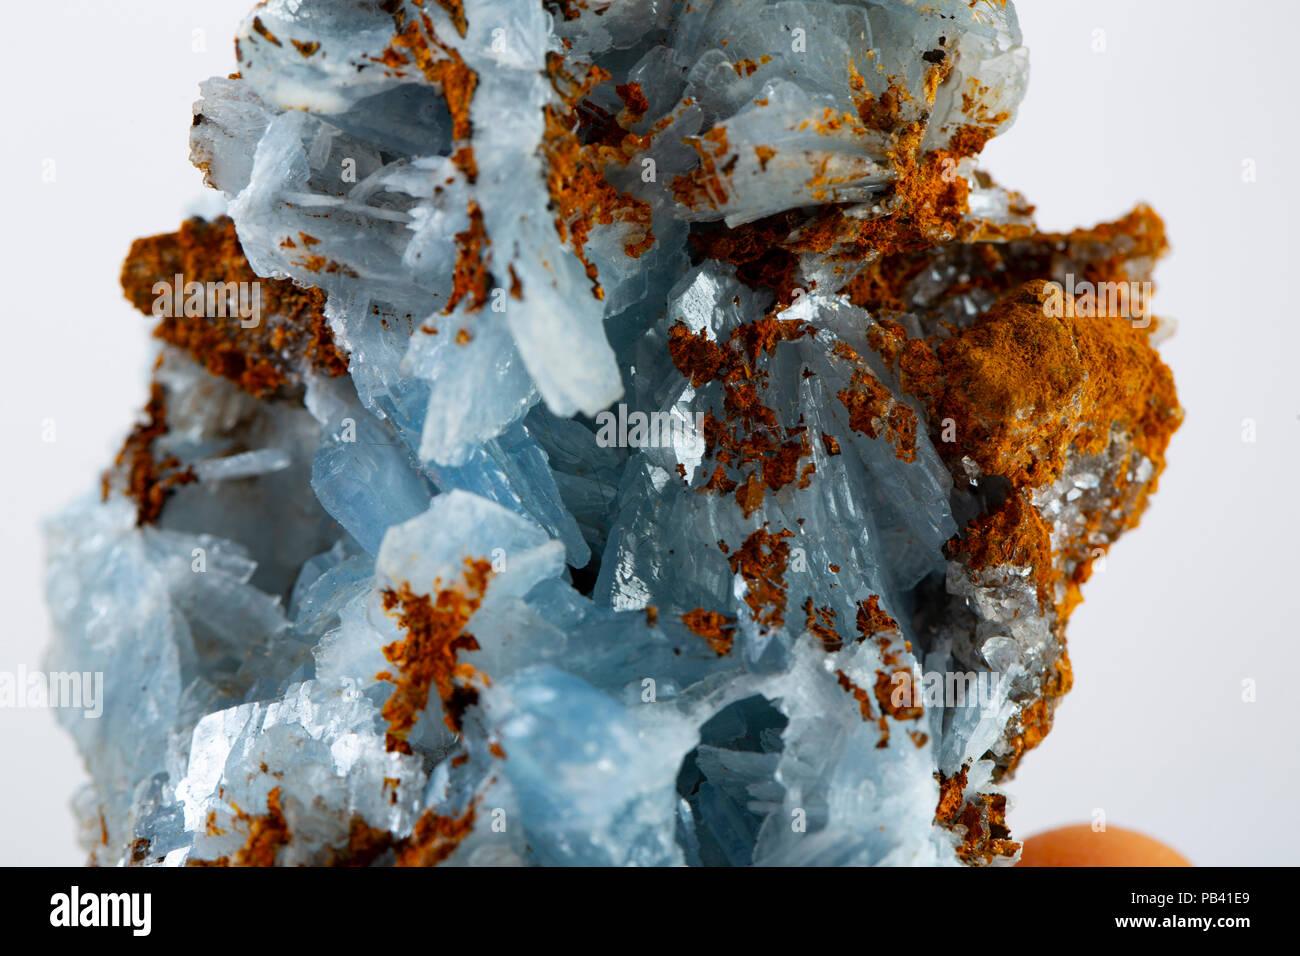 Blue barite mineral specimen - Stock Image